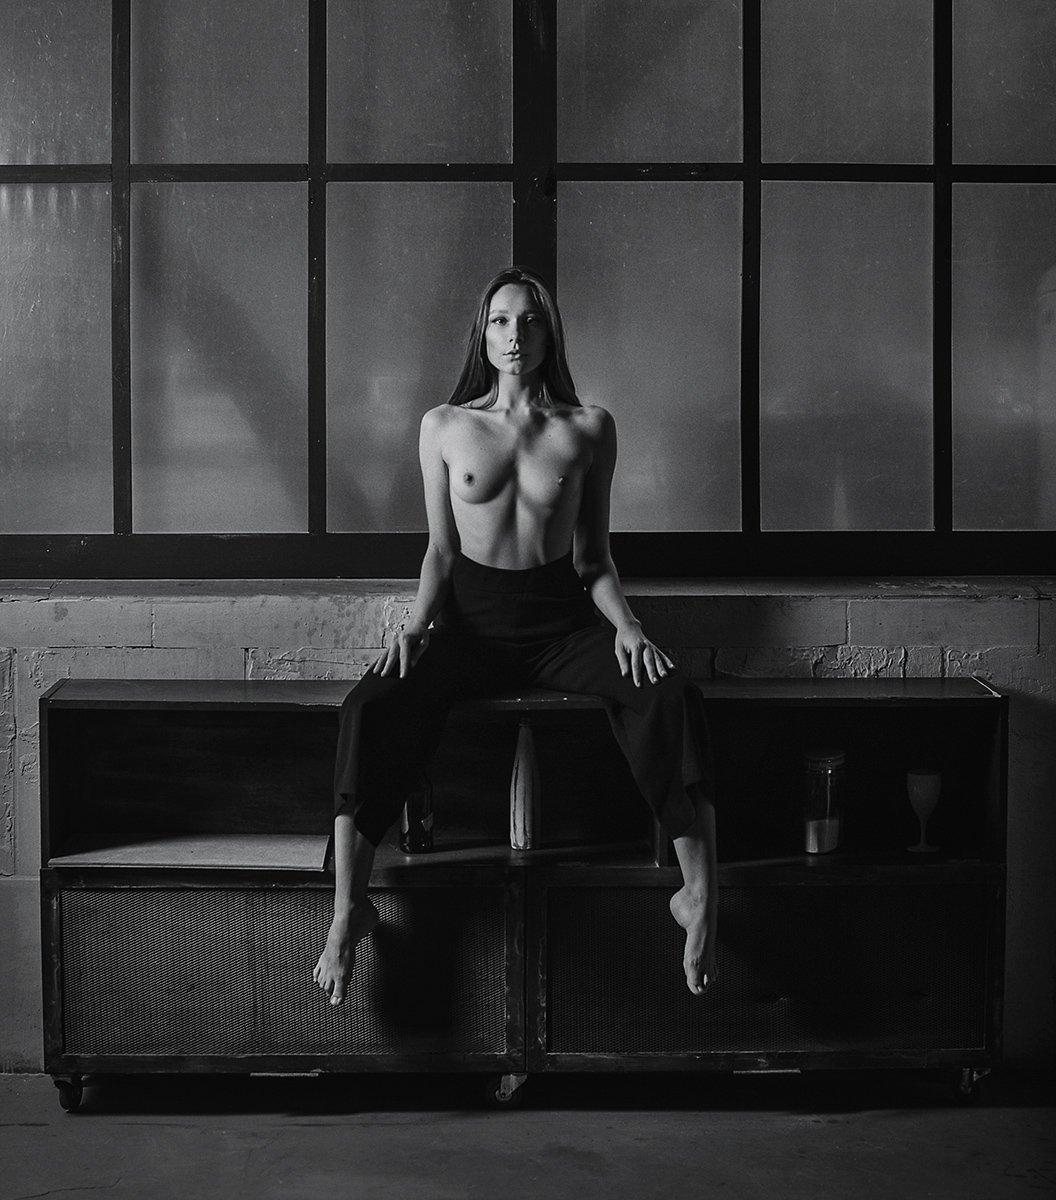 nude  nude woman workshop fine art monochrome arkadiy kurta, Курта Аркадий